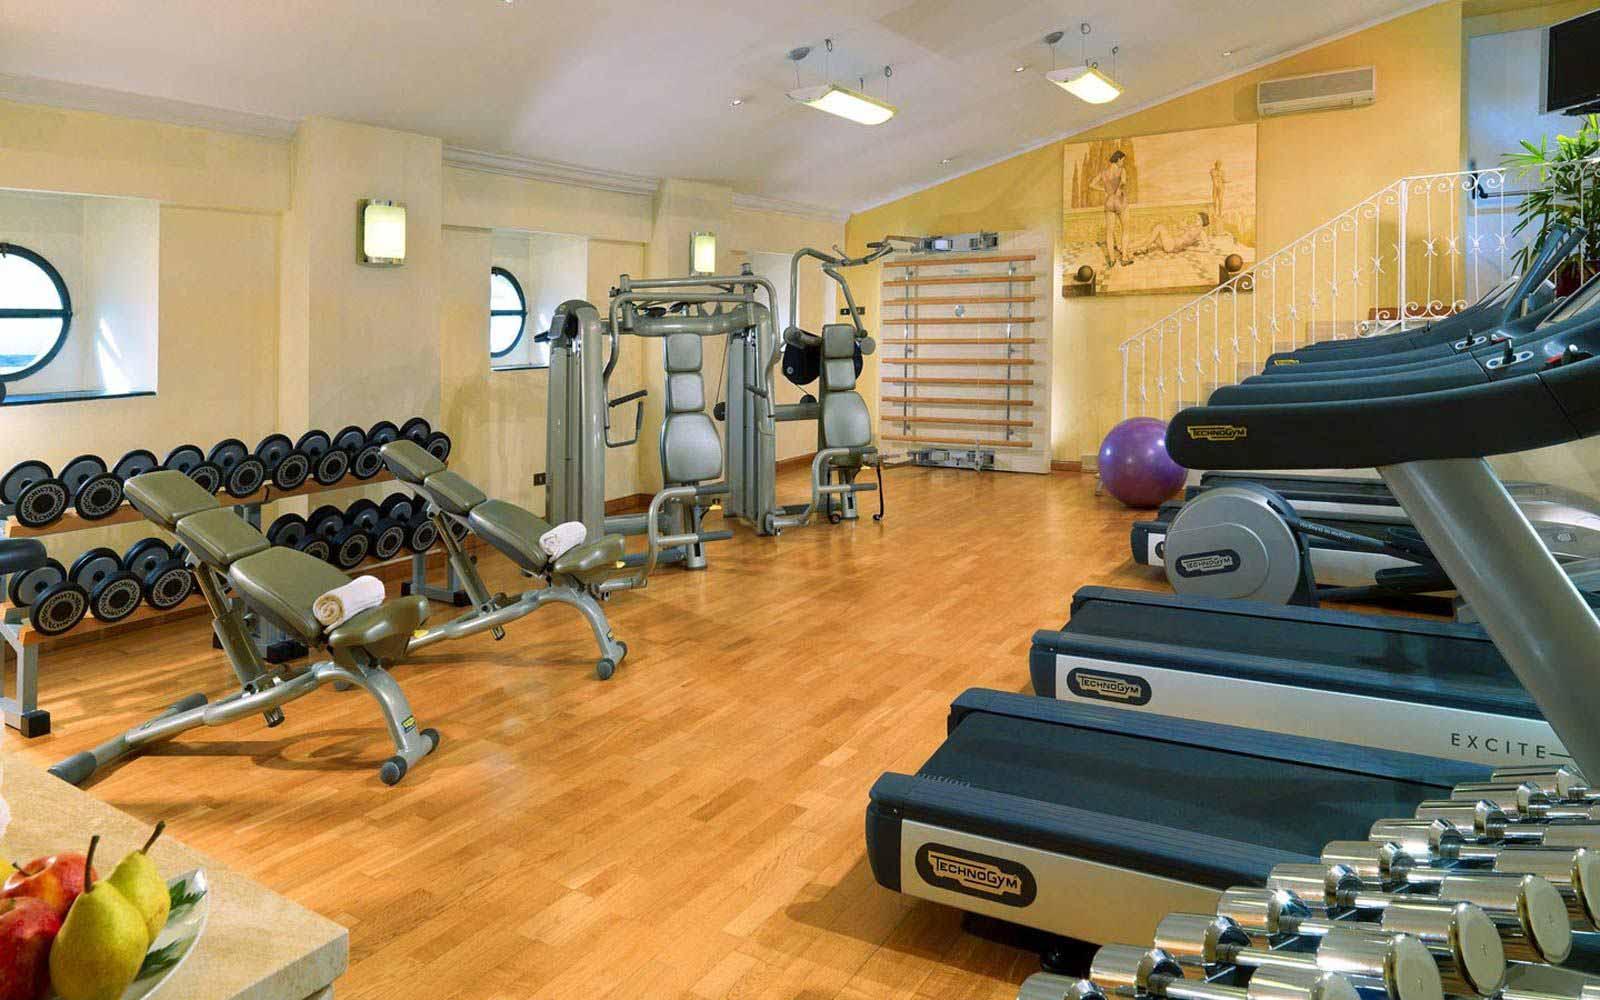 KamiSpa fitness centre at St.Regis Grand Hotel